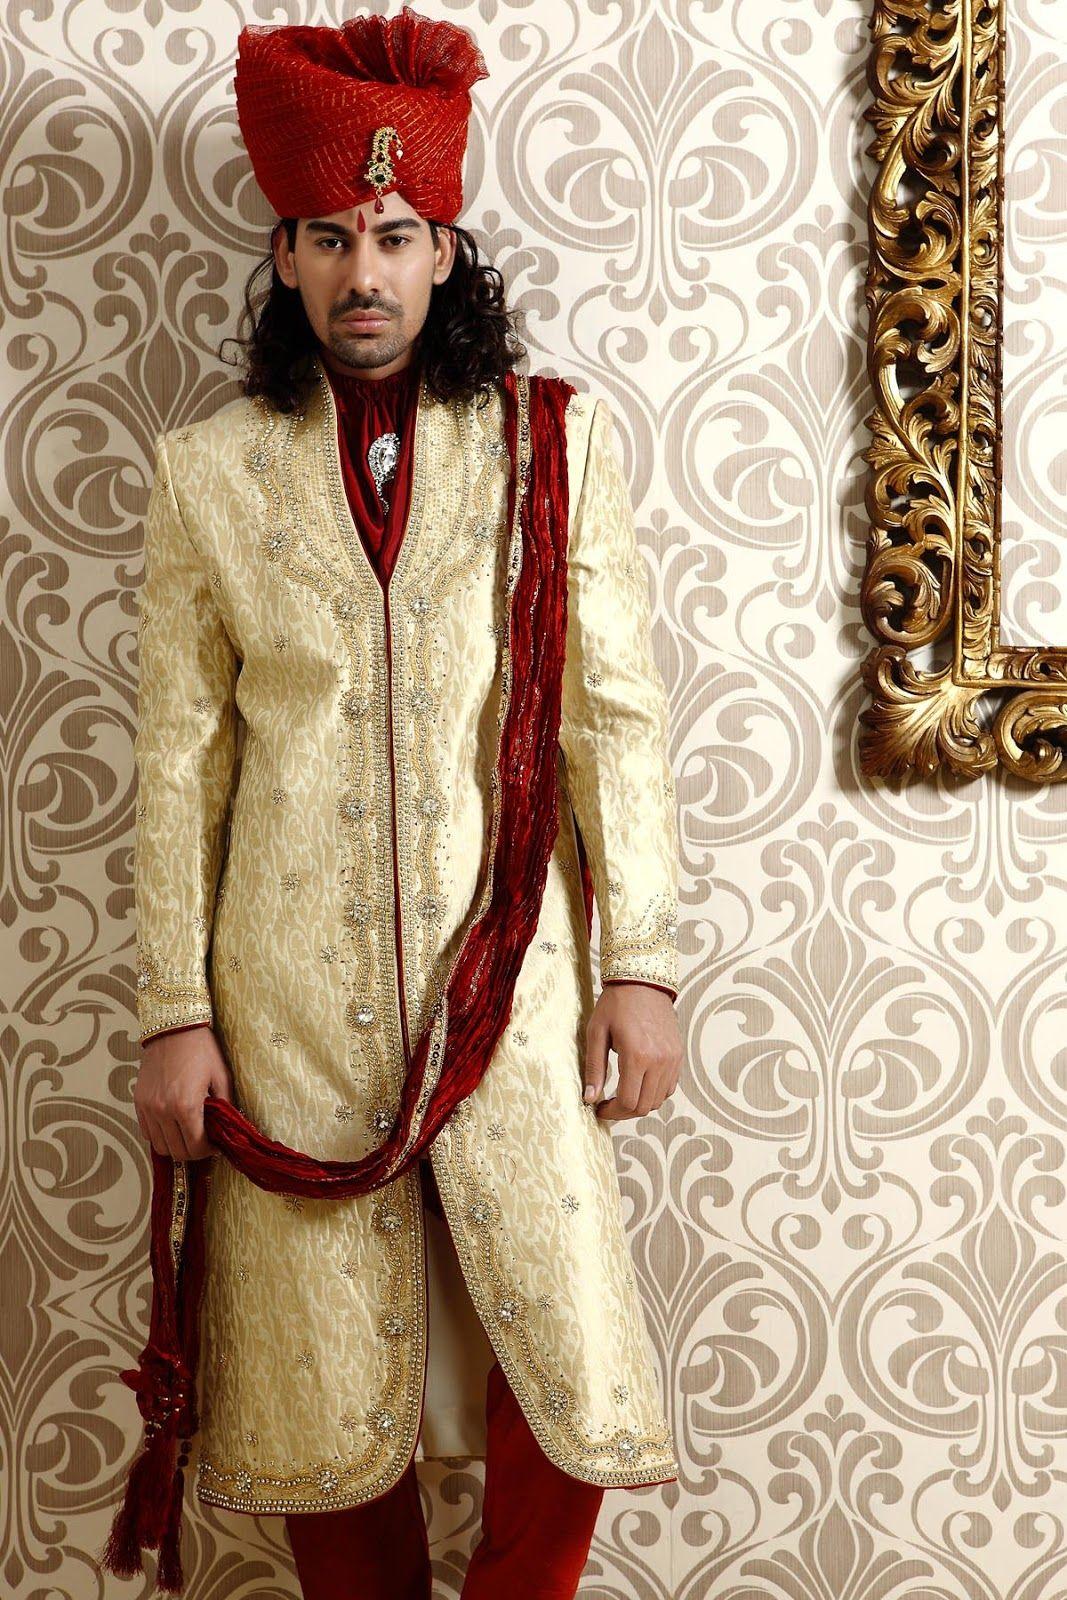 Pin by Gina Cercone on Midsummer   Pinterest   Wedding dress men ...